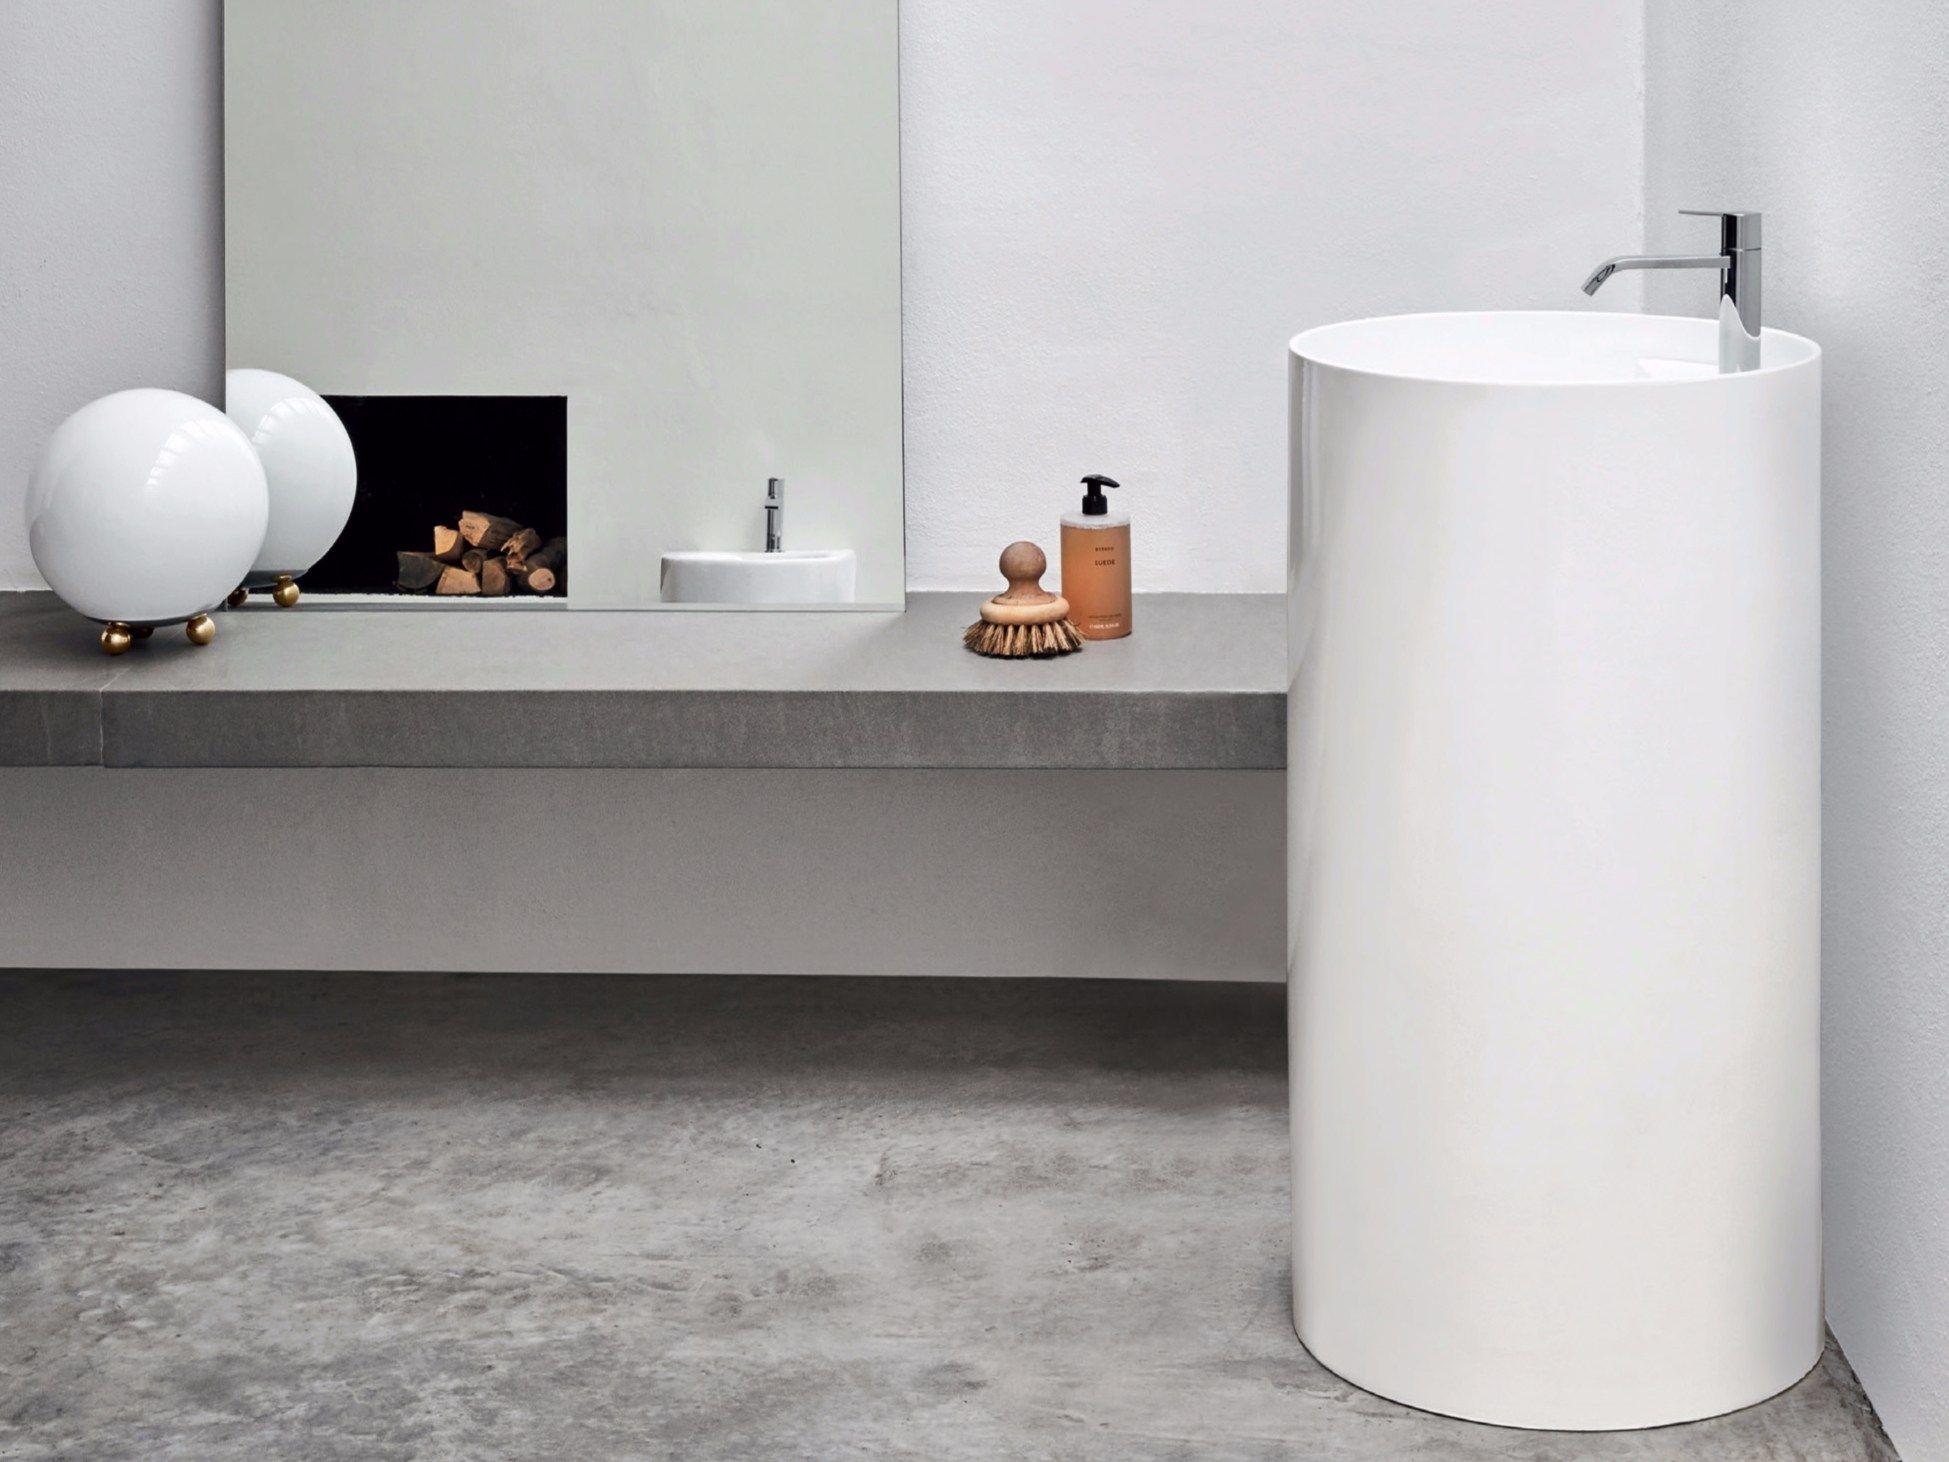 https://img.edilportale.com/products/OVVIO-Freestanding-washbasin-Nic-Design-300667-rel92d61e9d.jpg